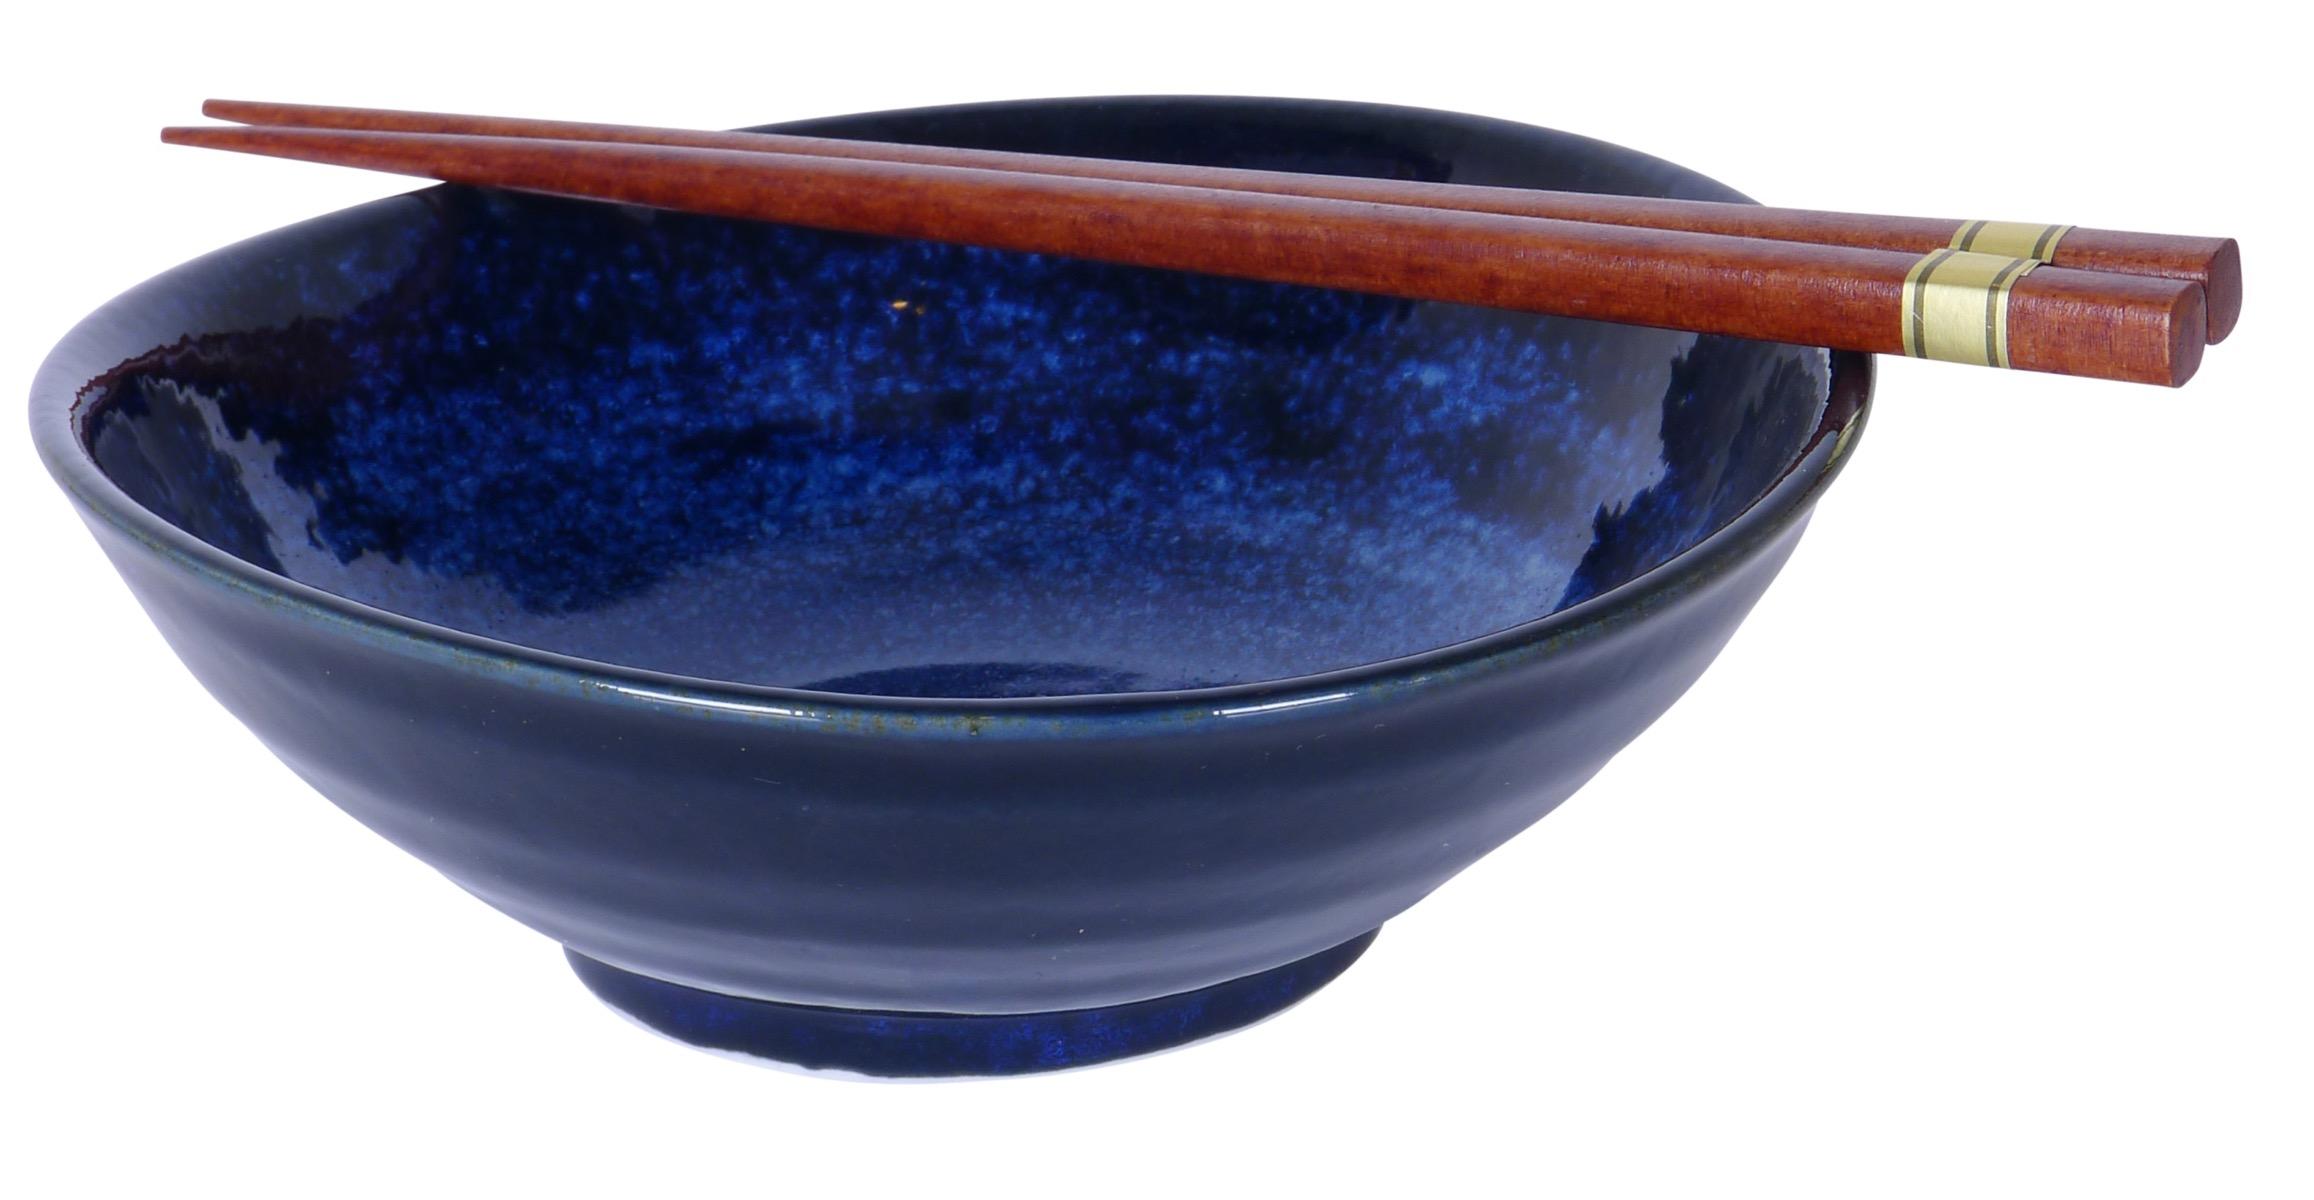 Image of Cobalt Blue Shallow Bowls 7x2.5-Inch